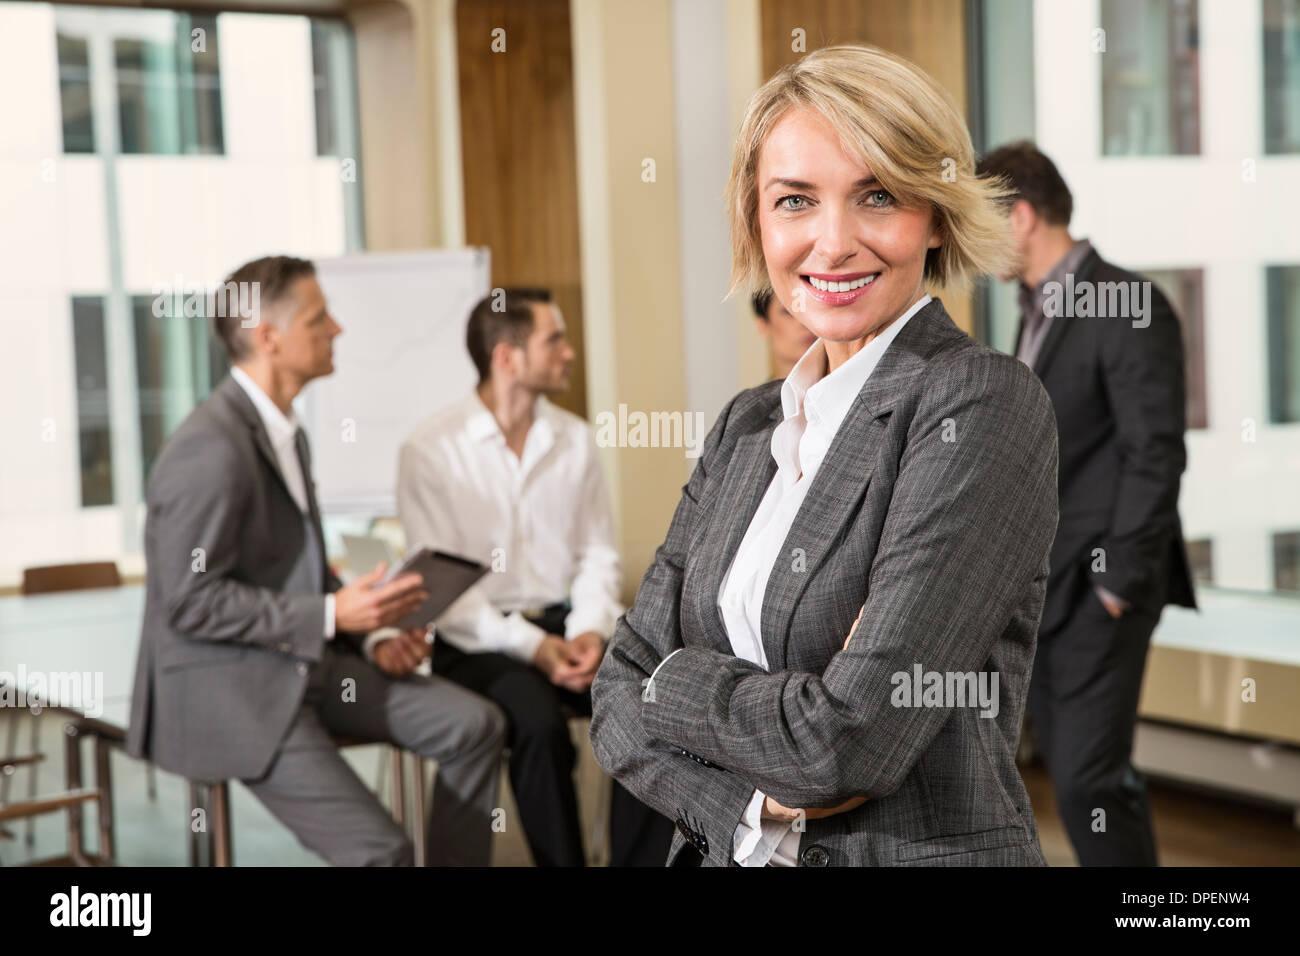 Geschäftsfrau vor Kollegen Stockbild